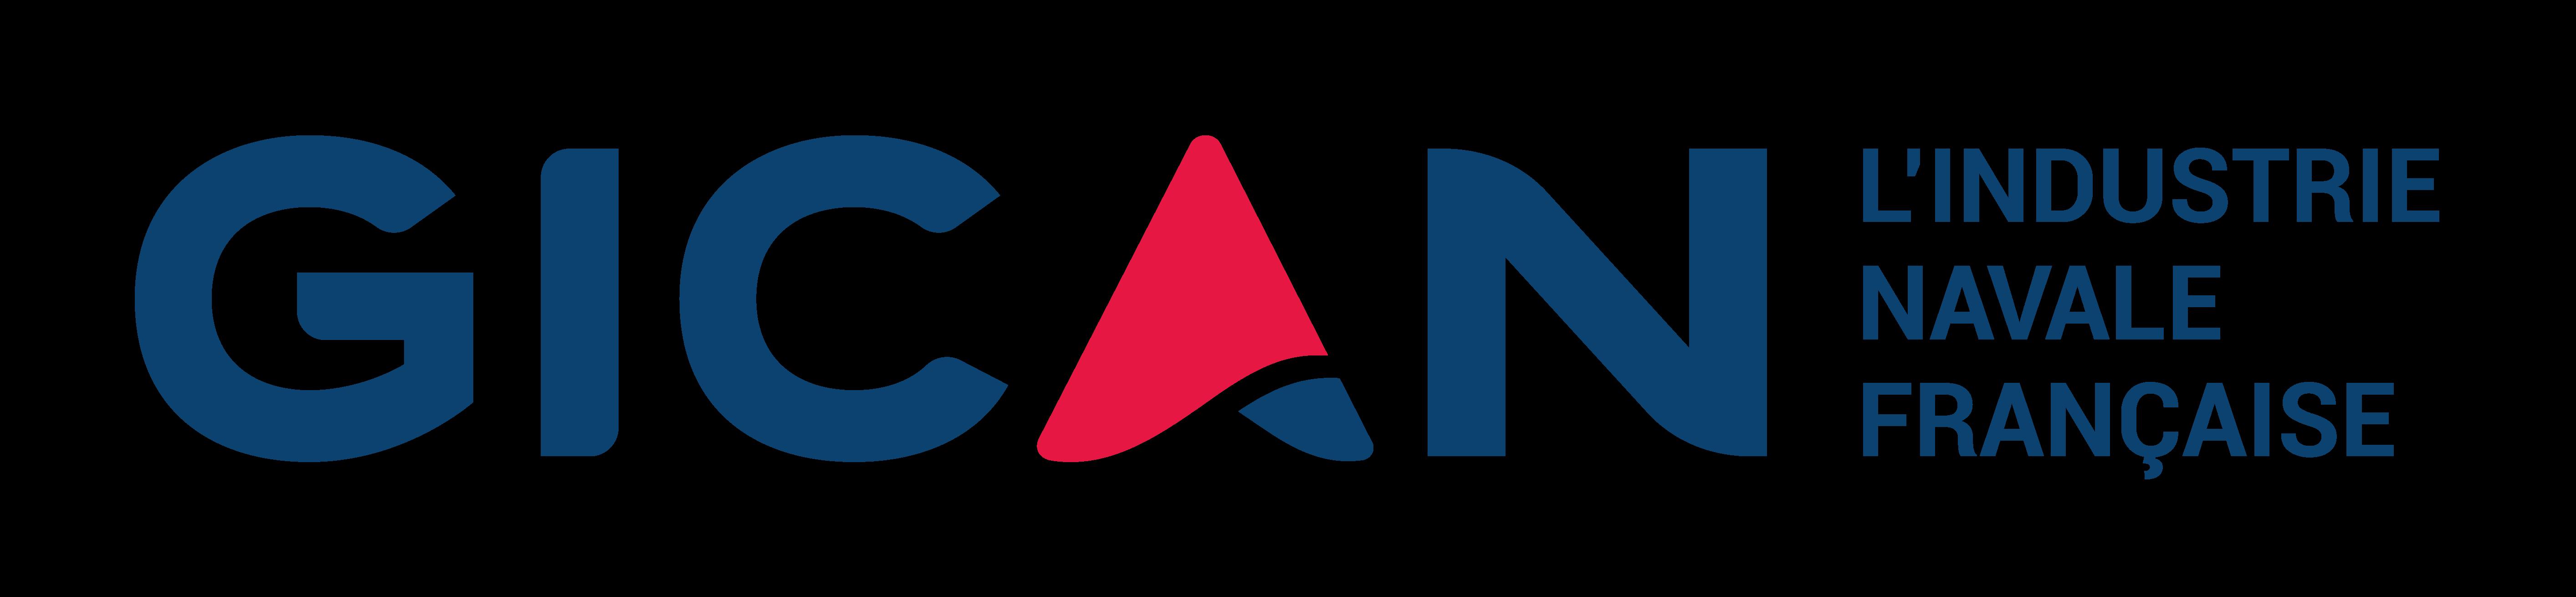 GICAN_SIGN_FR_Q (002)